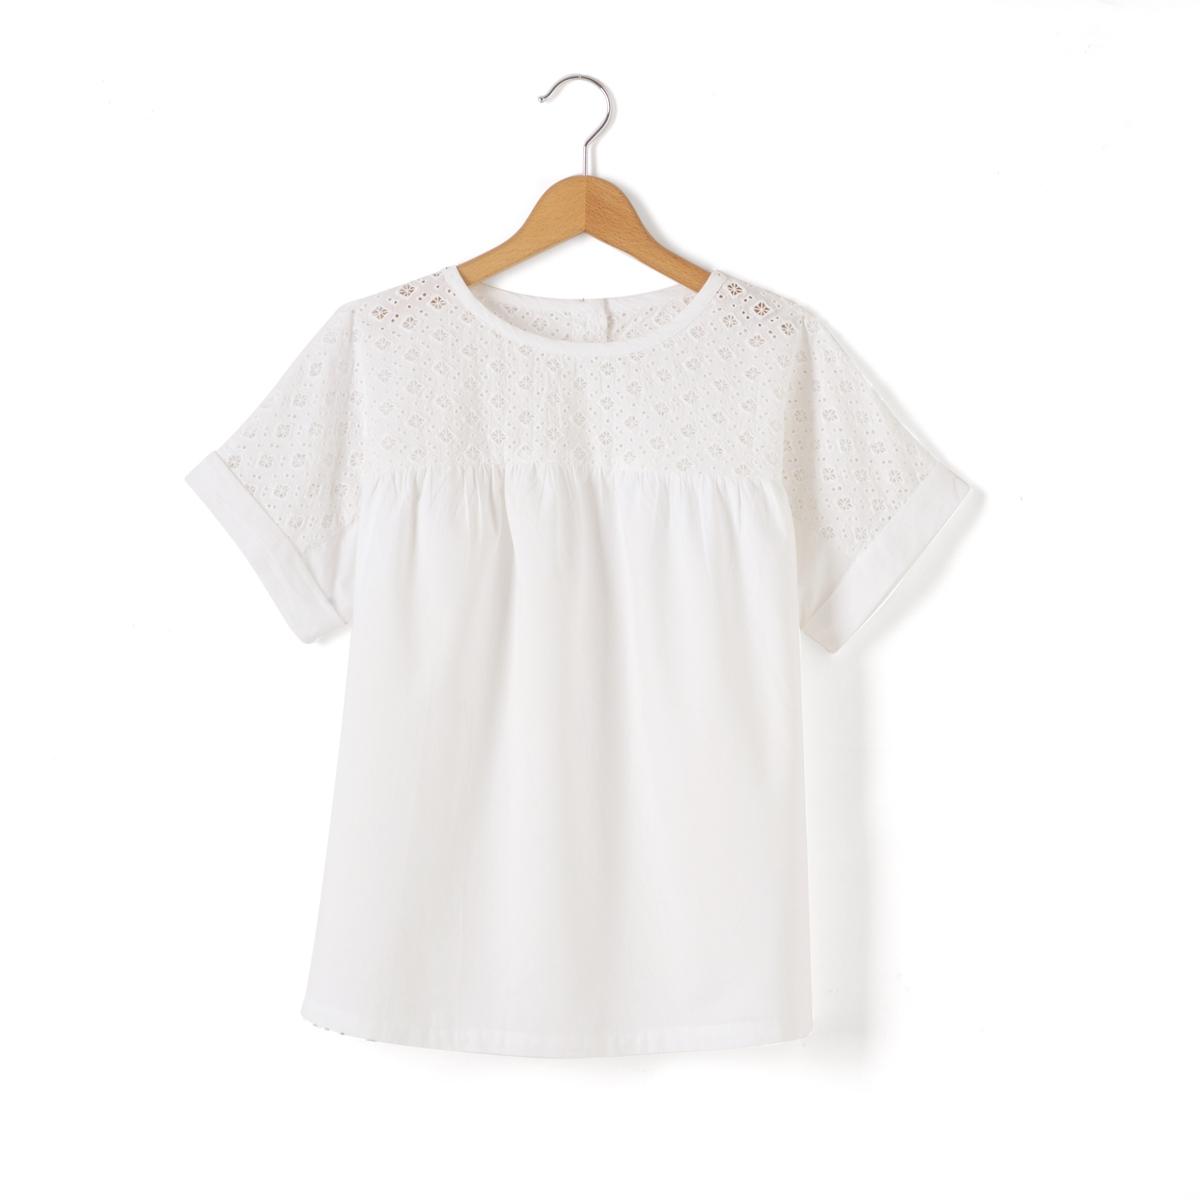 Блузка со складками, 10-16 лет